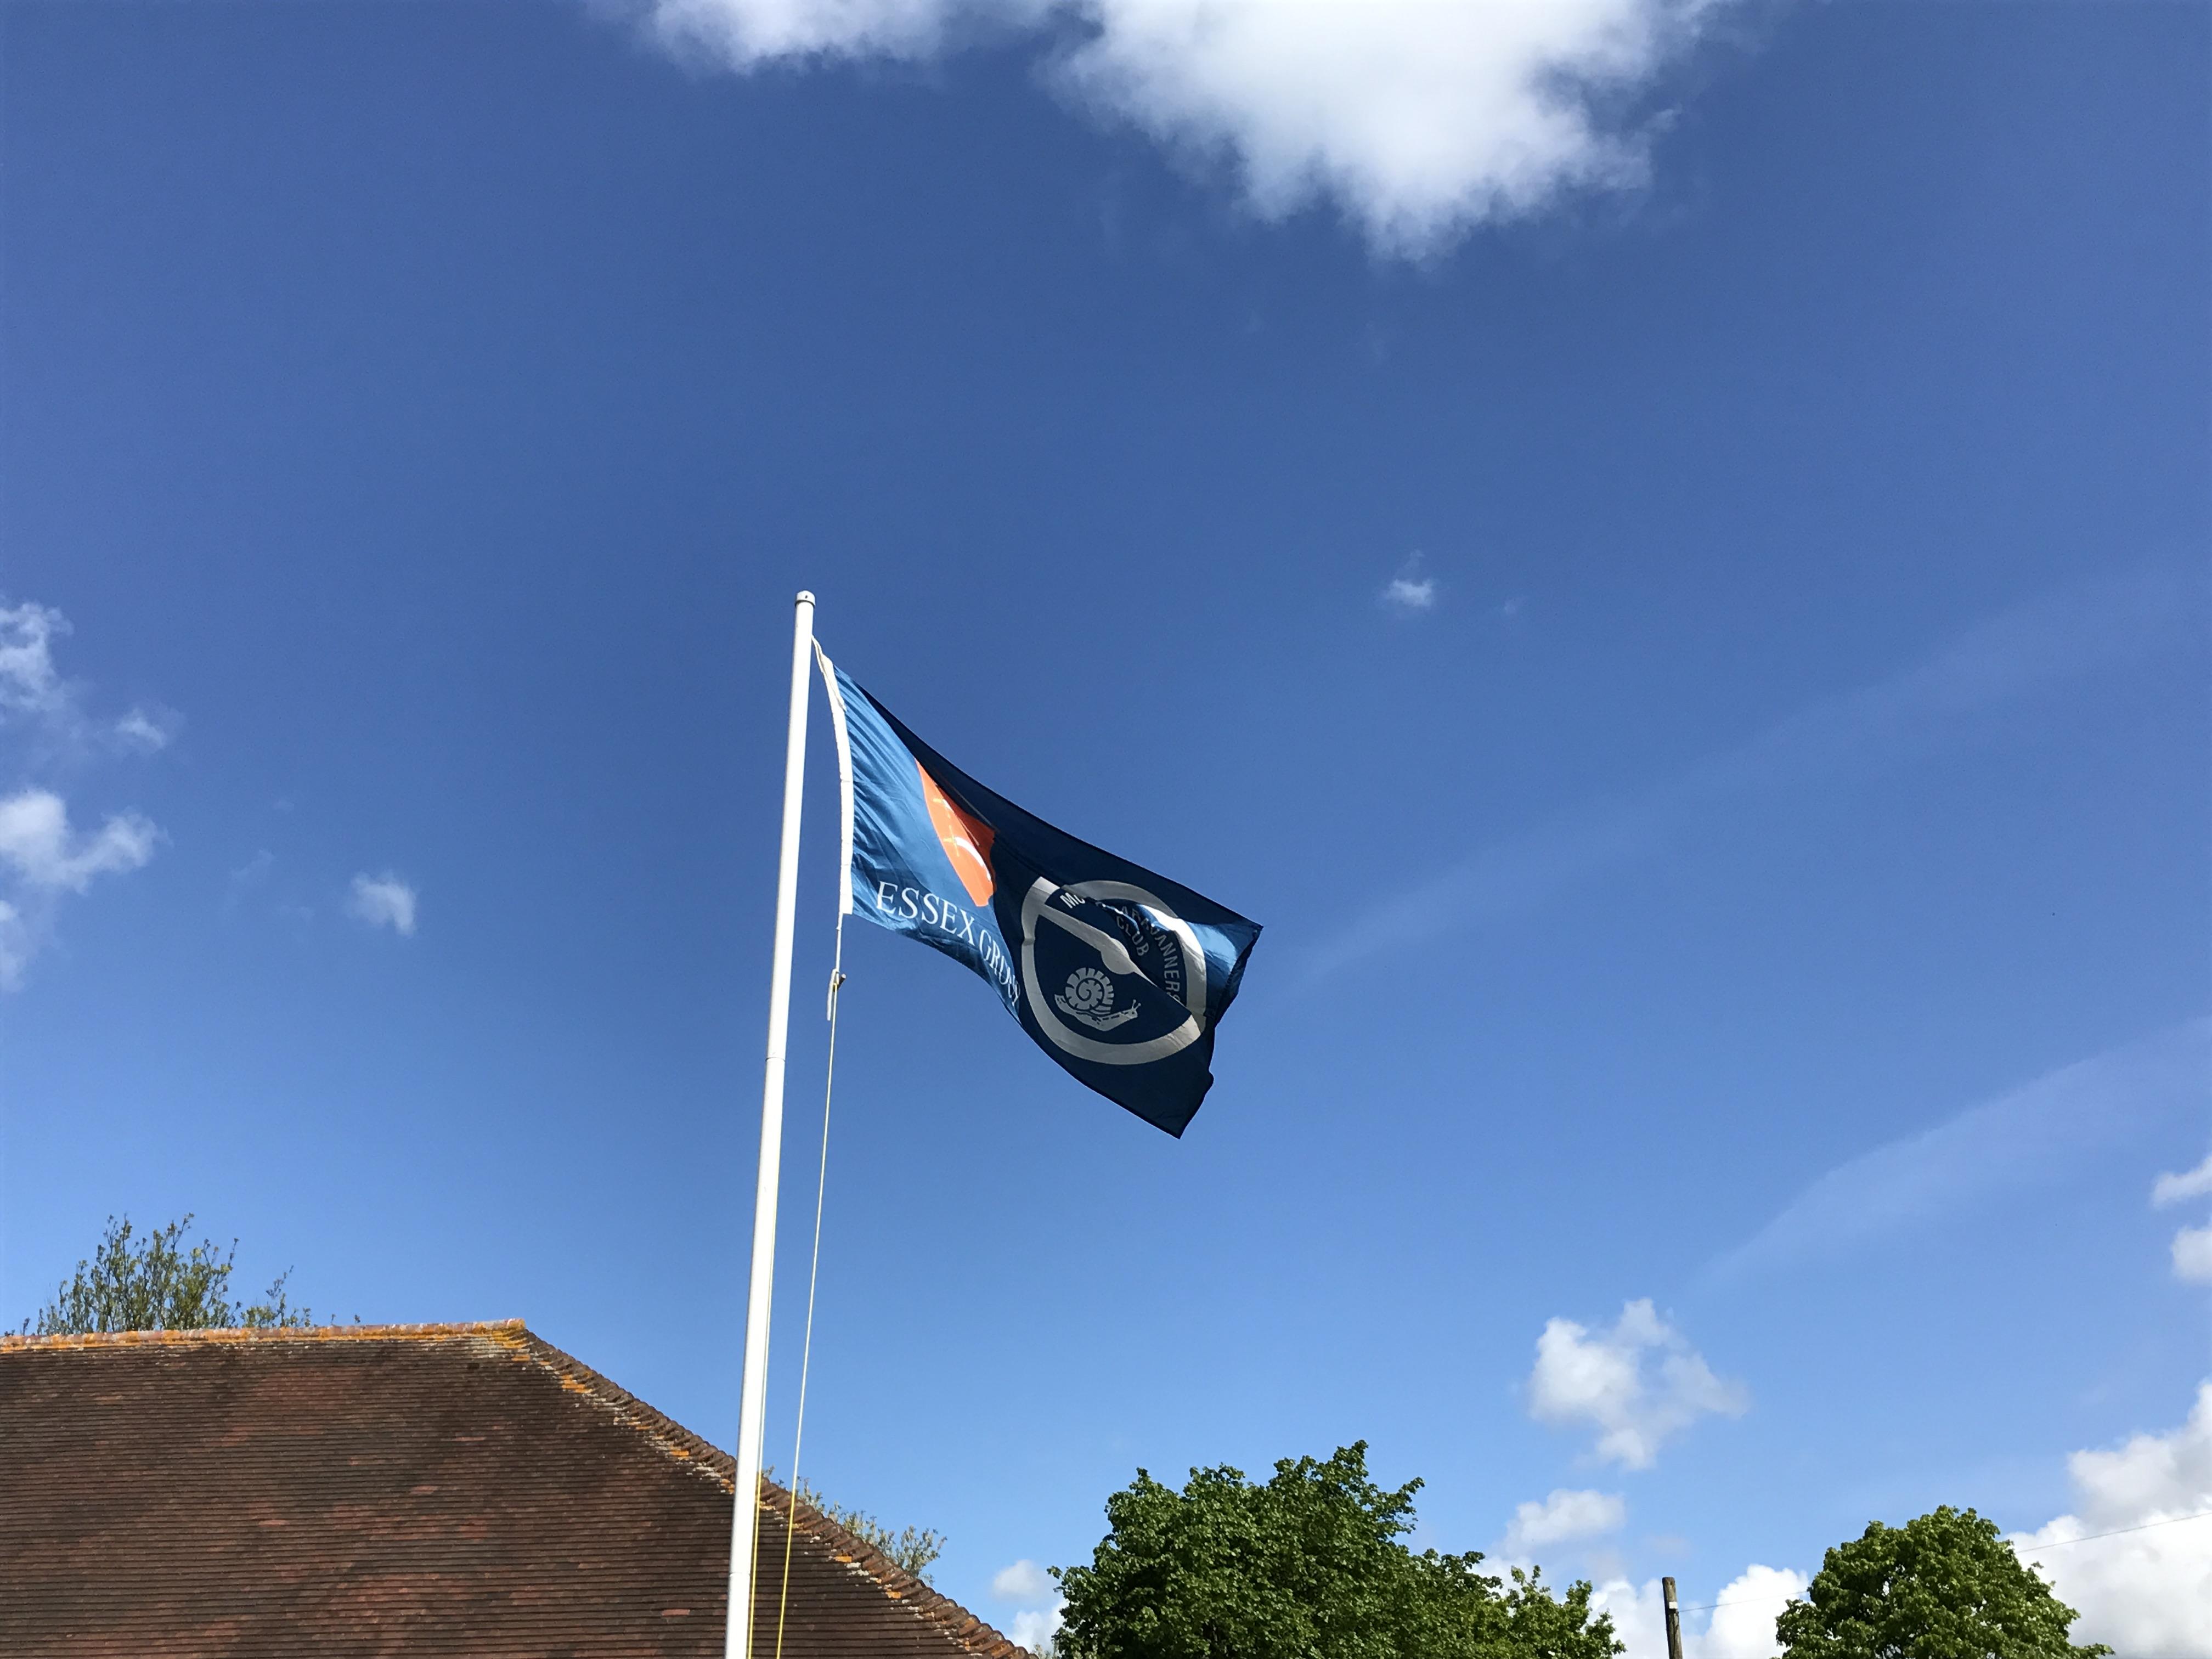 Essex Group Flag